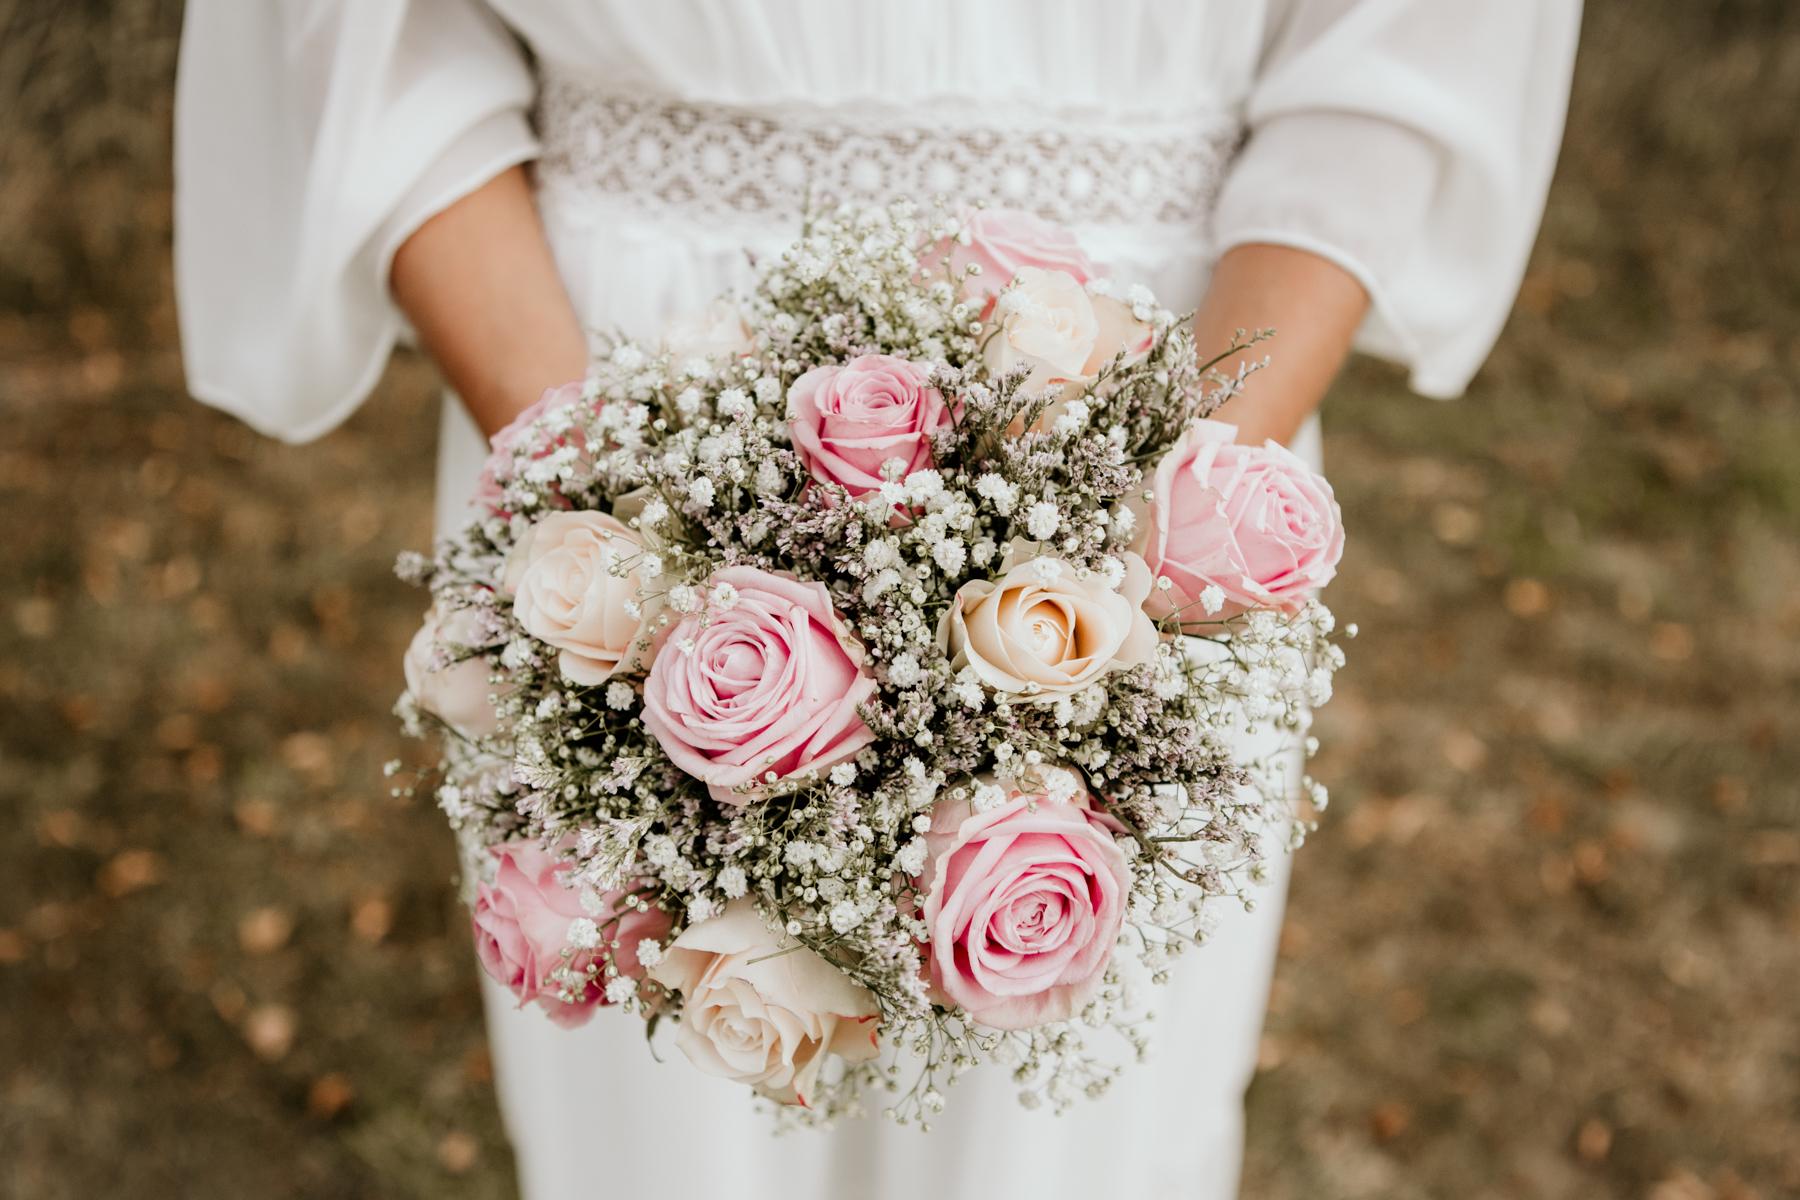 Styled Wedding 1 beeld.schoon-selinderella klein formaat-19